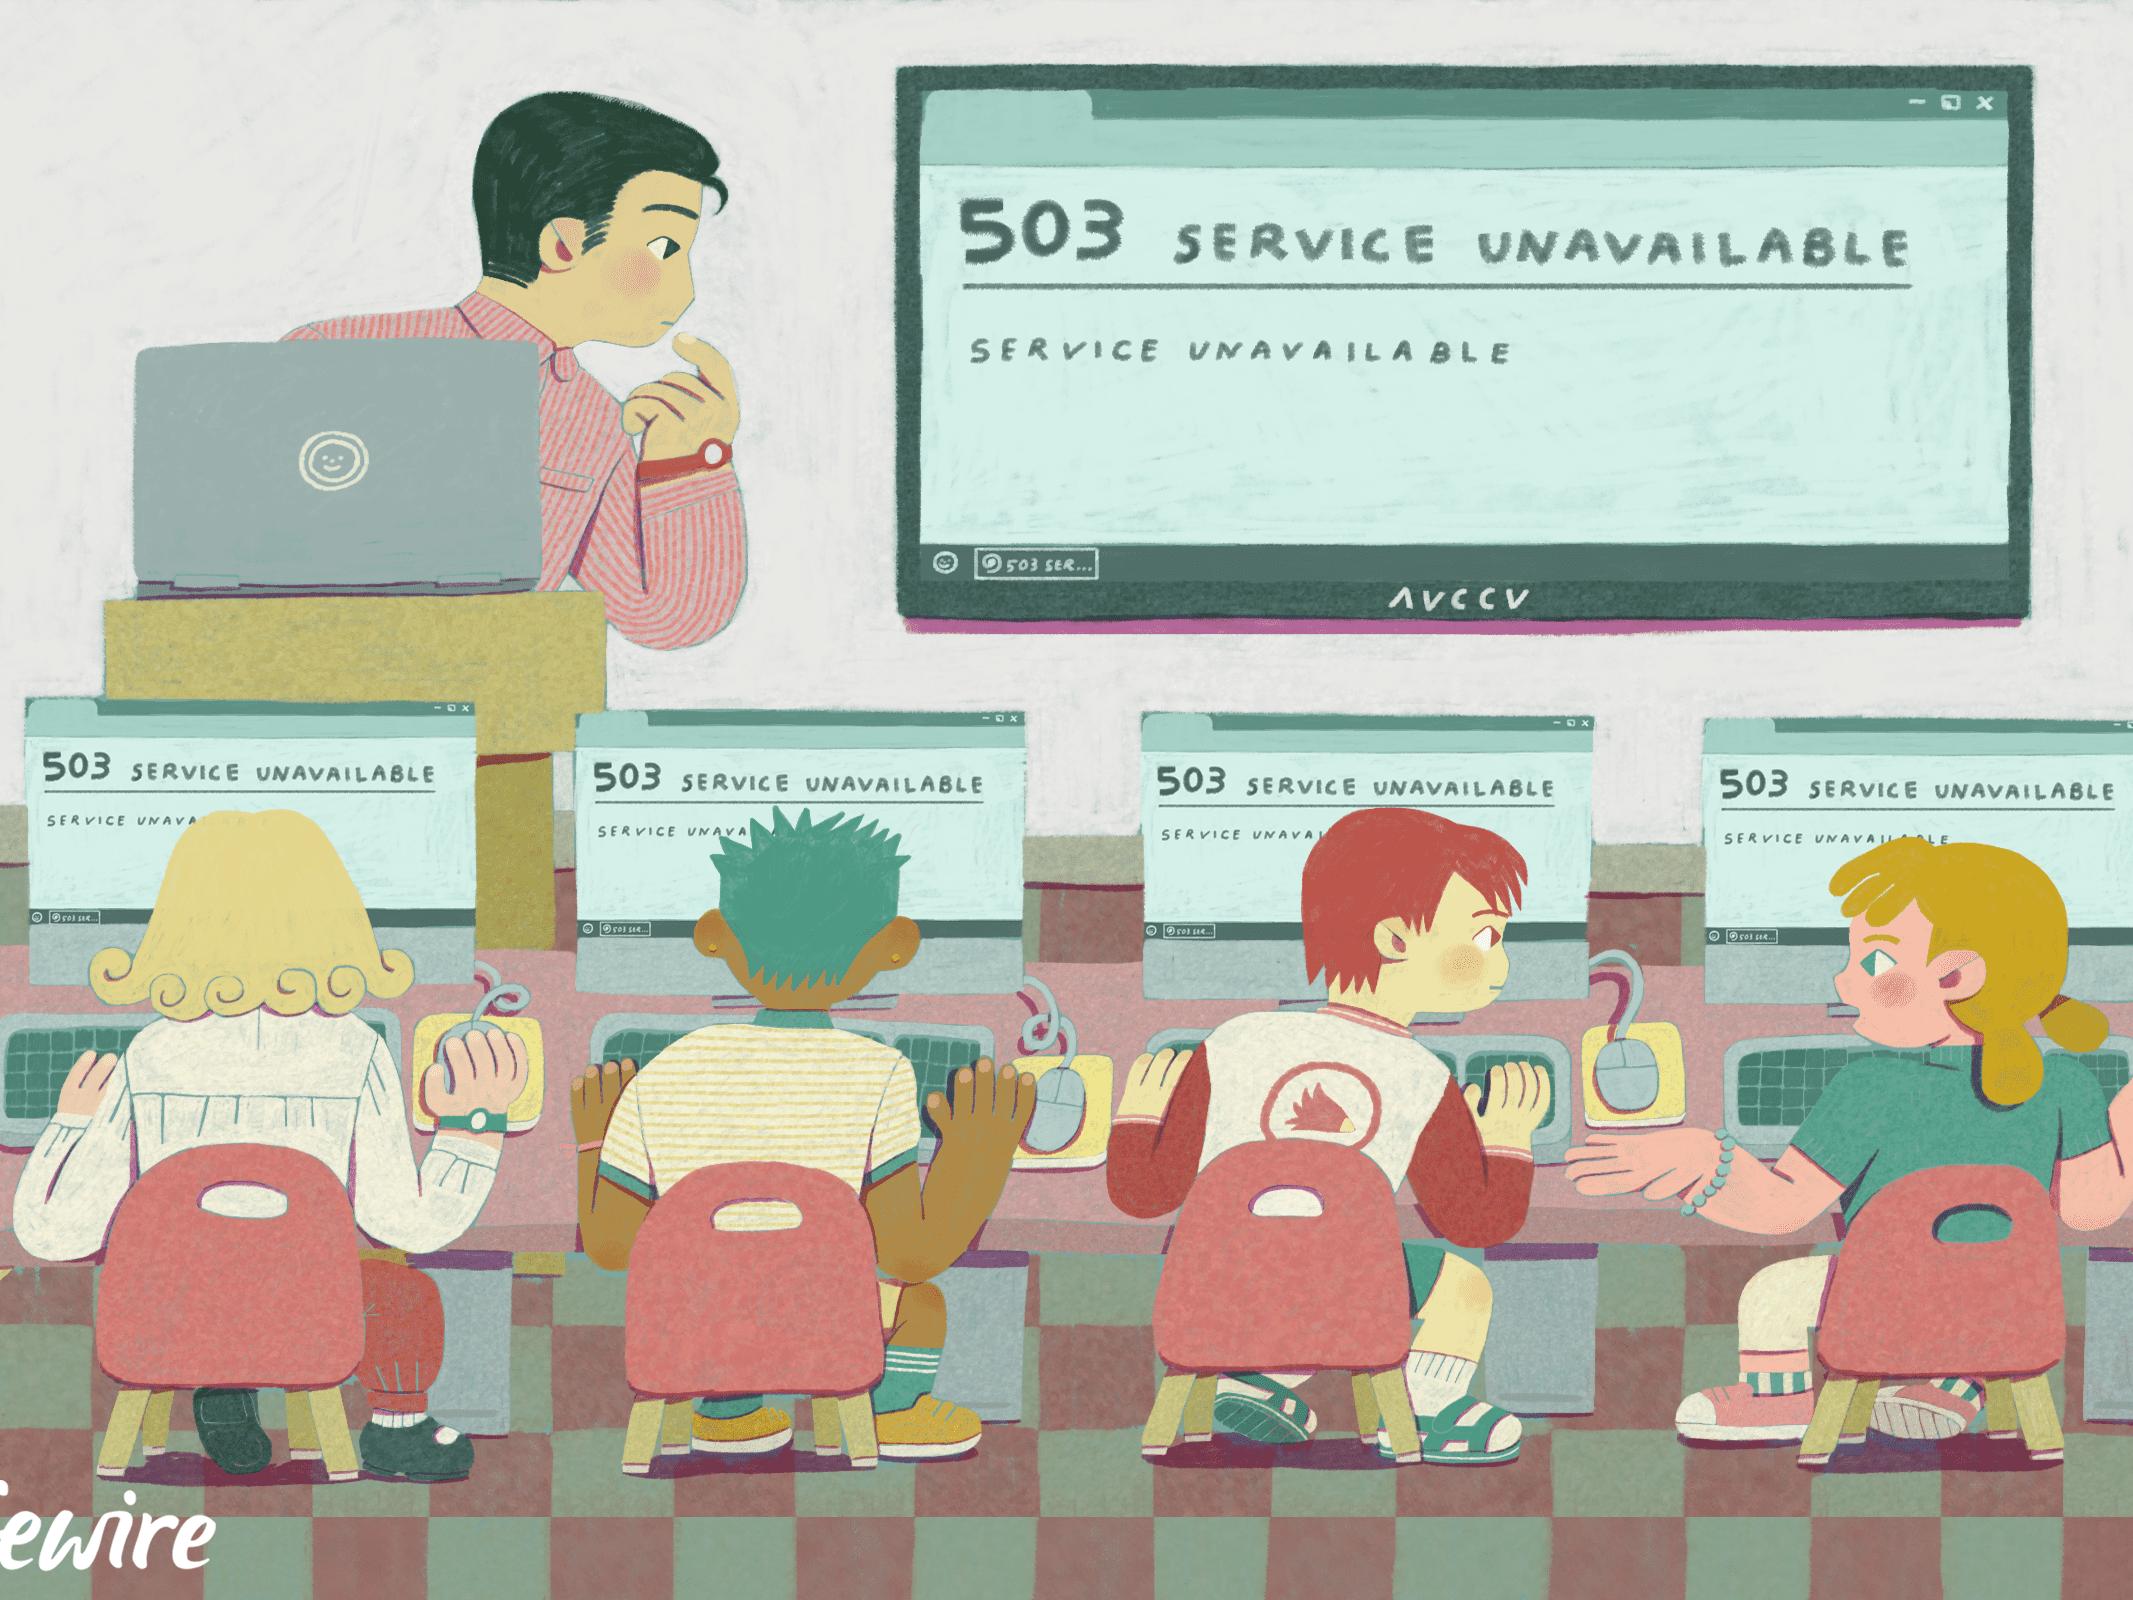 503 Service Unavailable Error (How to Fix It)